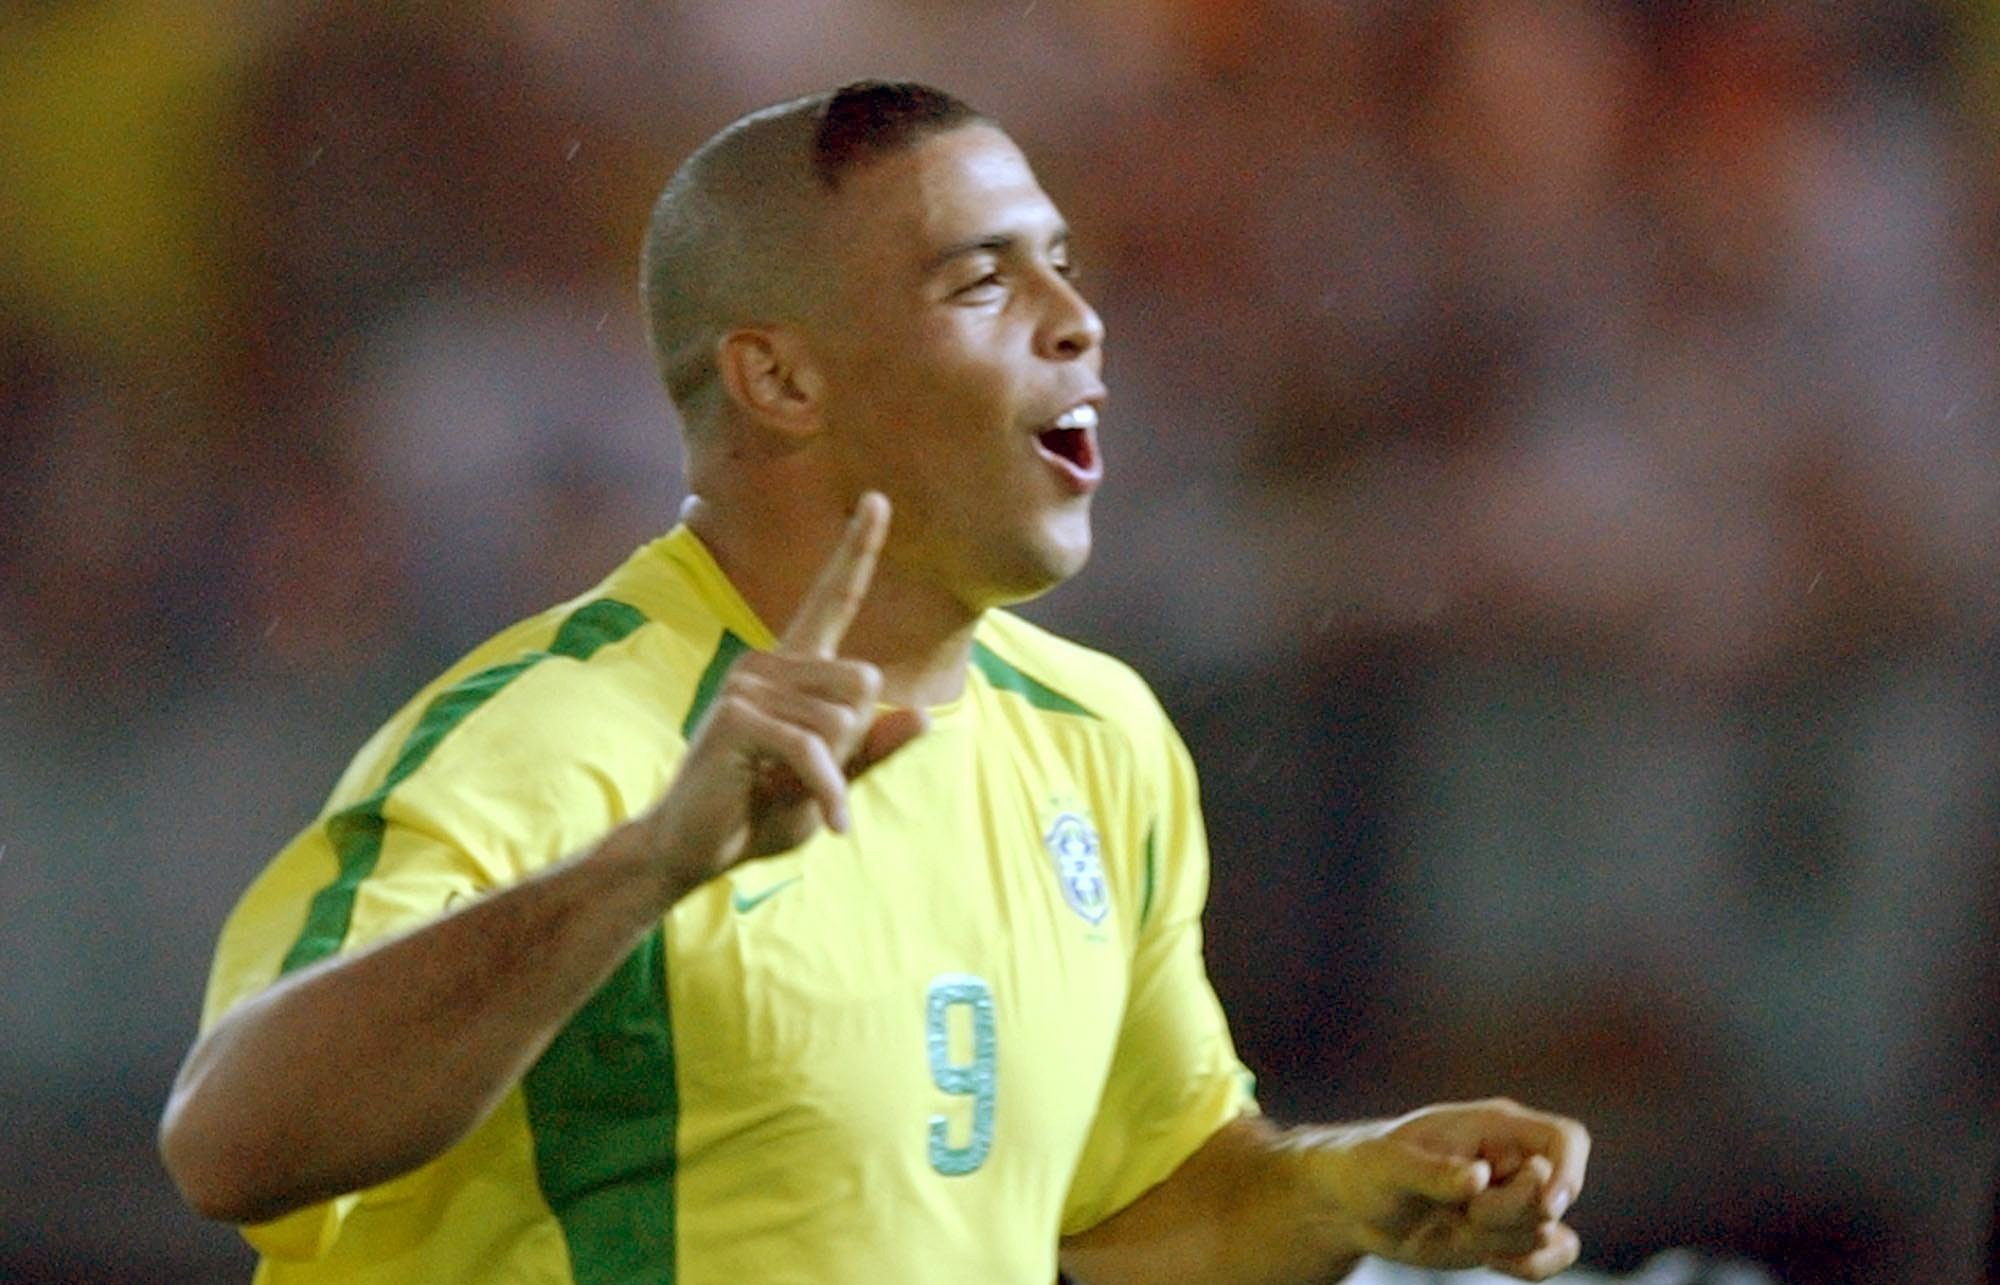 Soccer World Cup Final 2002: Brazil vs Germany - Ronaldo cheers